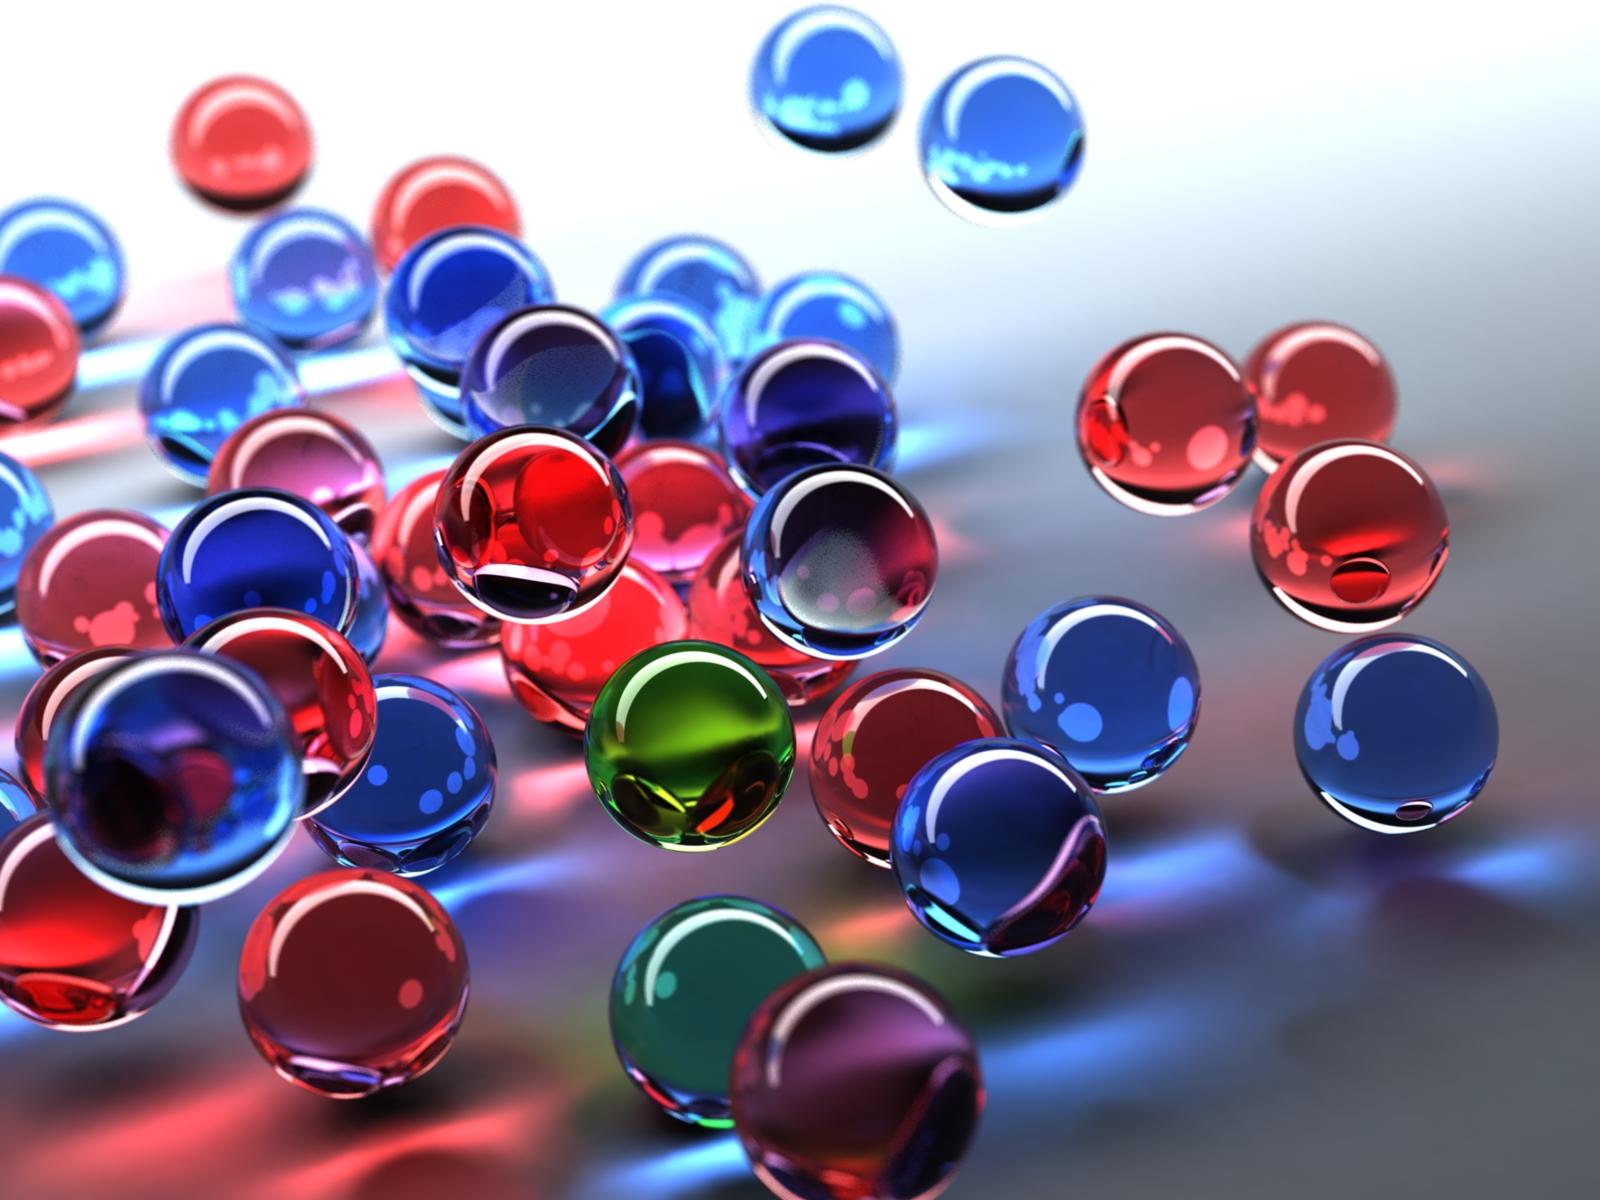 3d Bubbles Wallpaper: Color Bubbles Wallpapers And Images